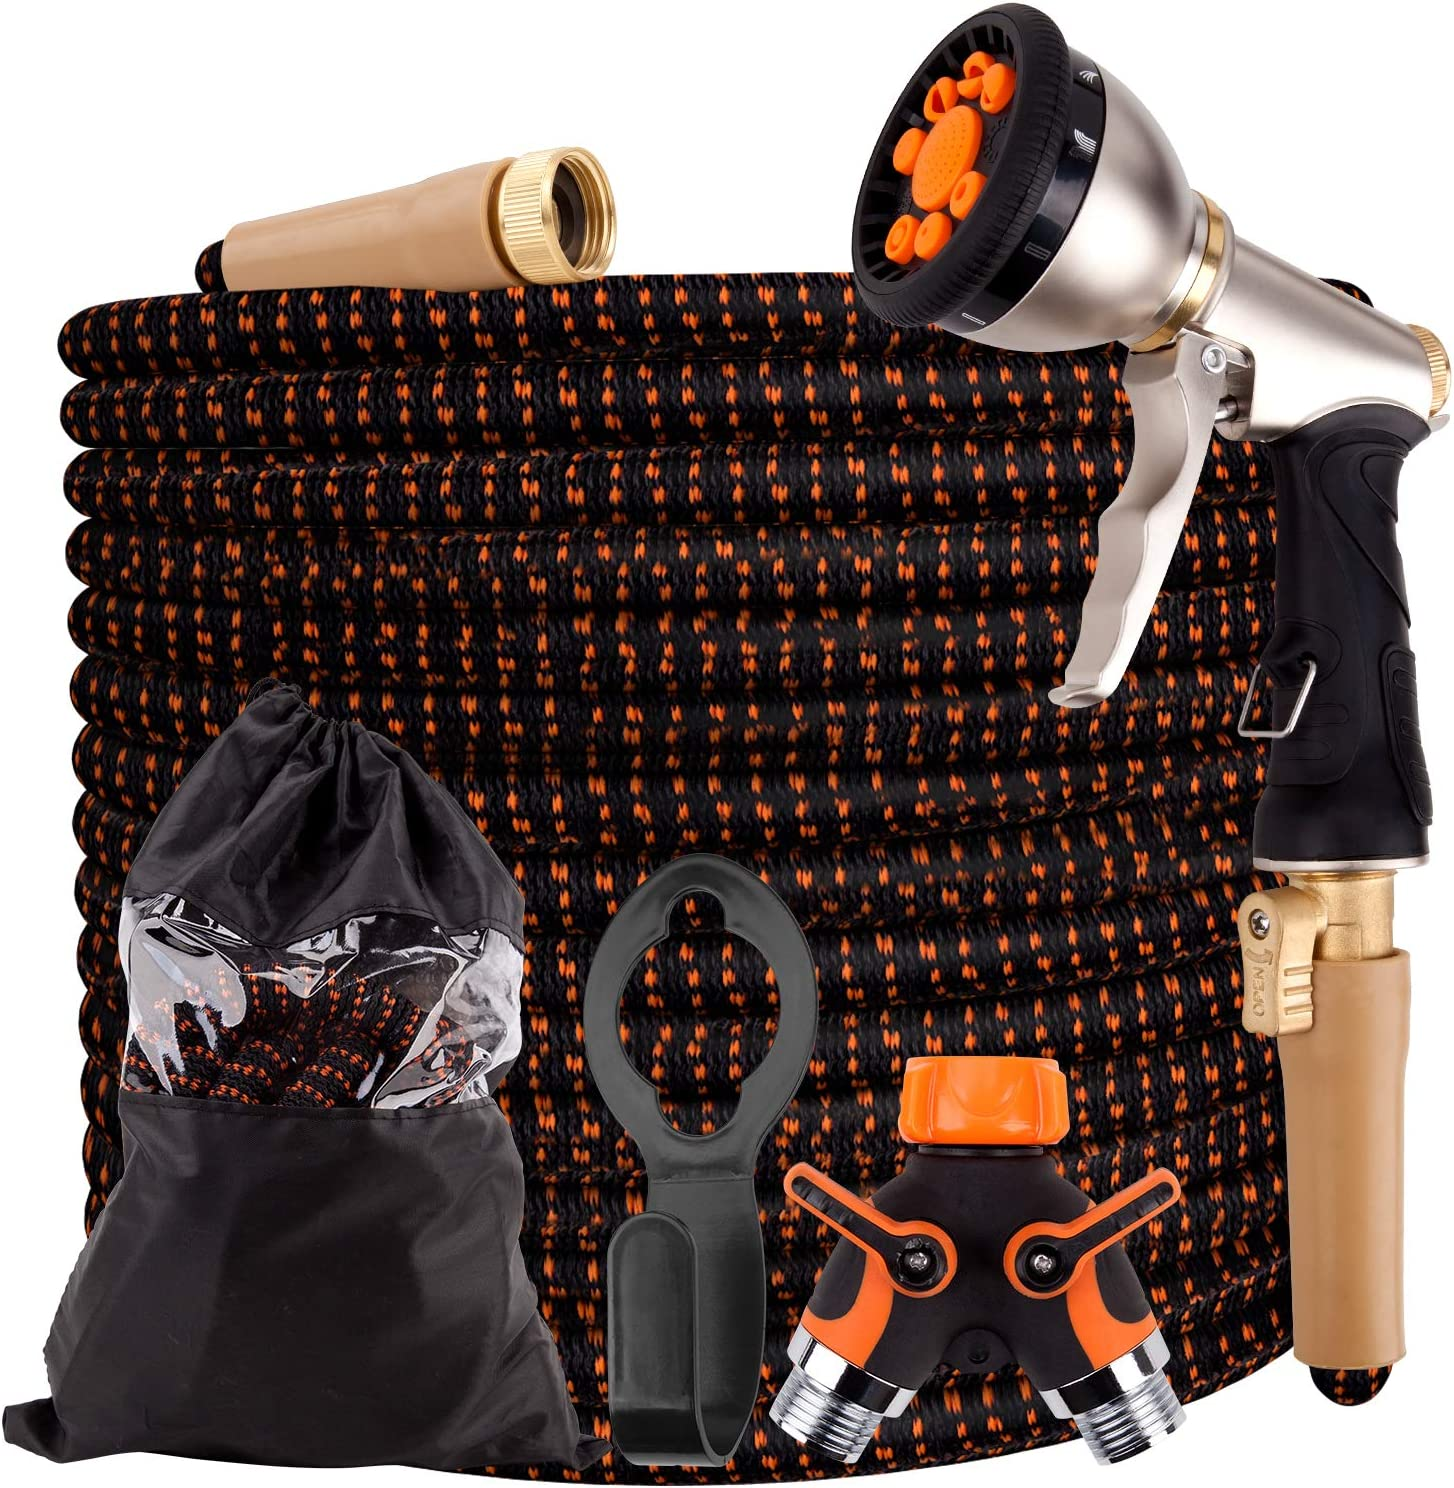 Expandable Garden Hose, Durable 3750D, 4-Layers Latex, 2-Way Splitter, 3/4